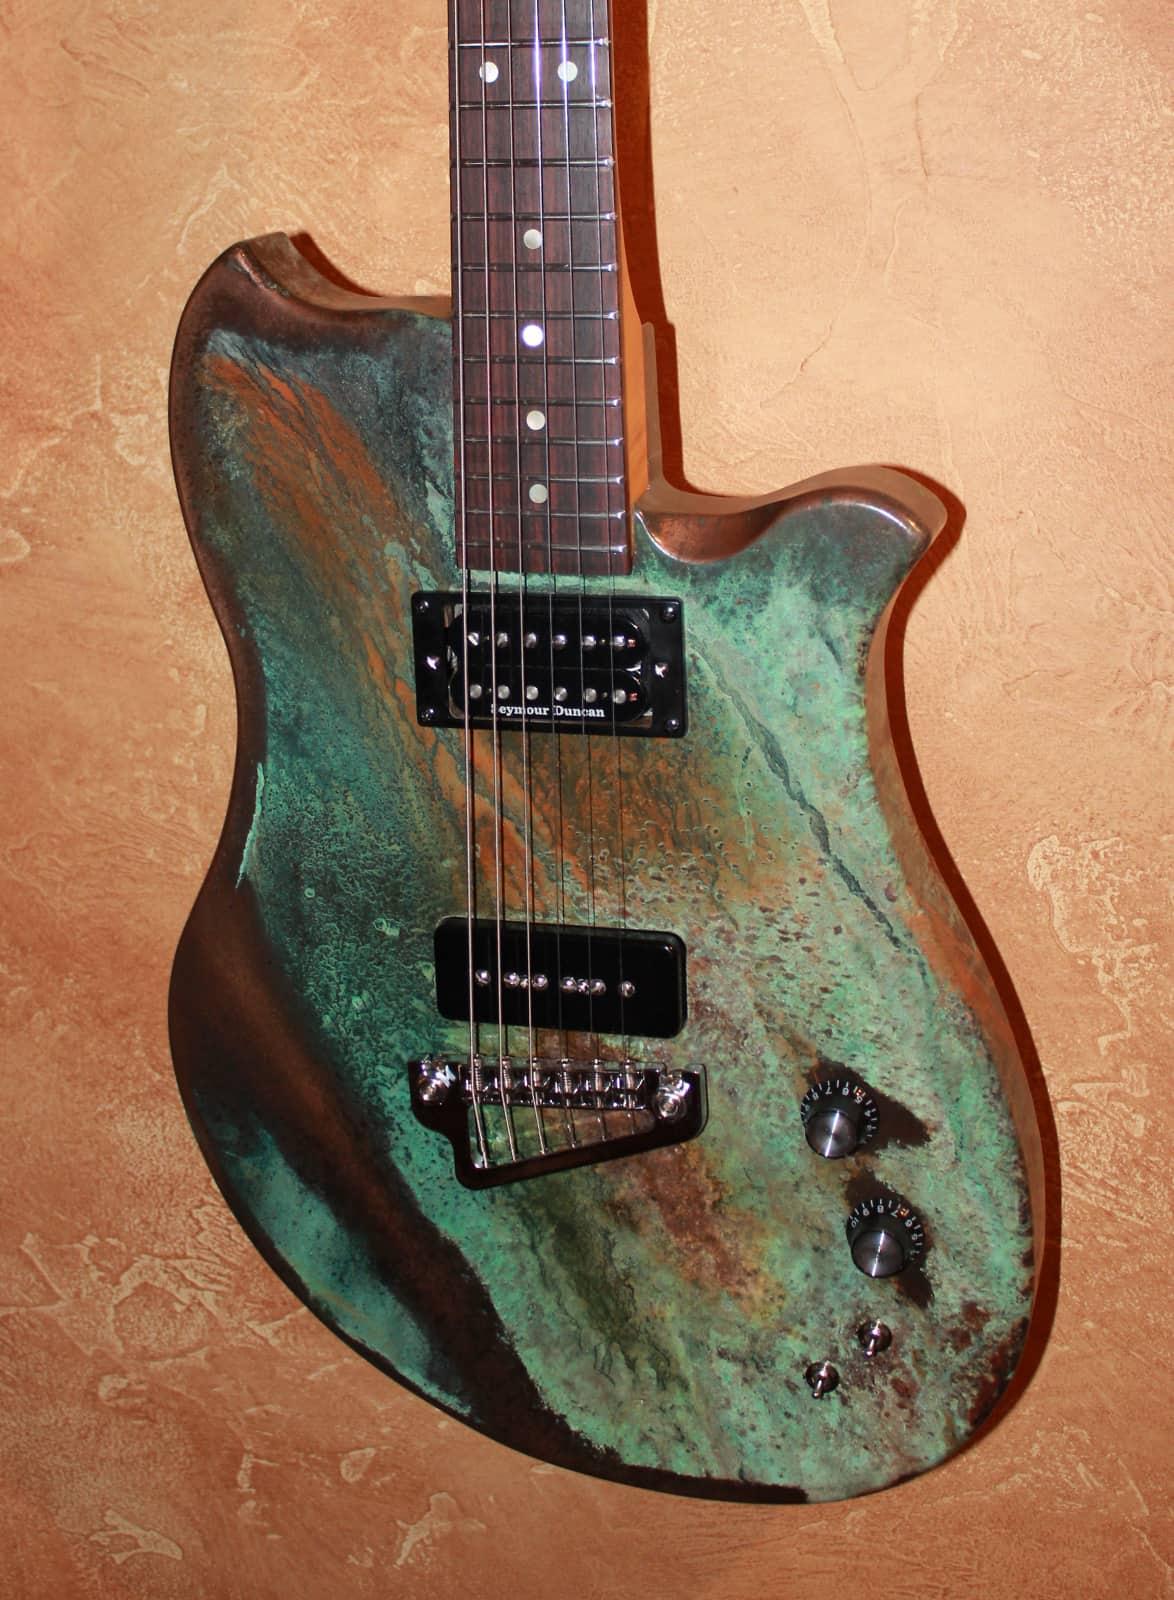 jam guitars usa roadster custom guitar 2016 bronze metal reverb. Black Bedroom Furniture Sets. Home Design Ideas